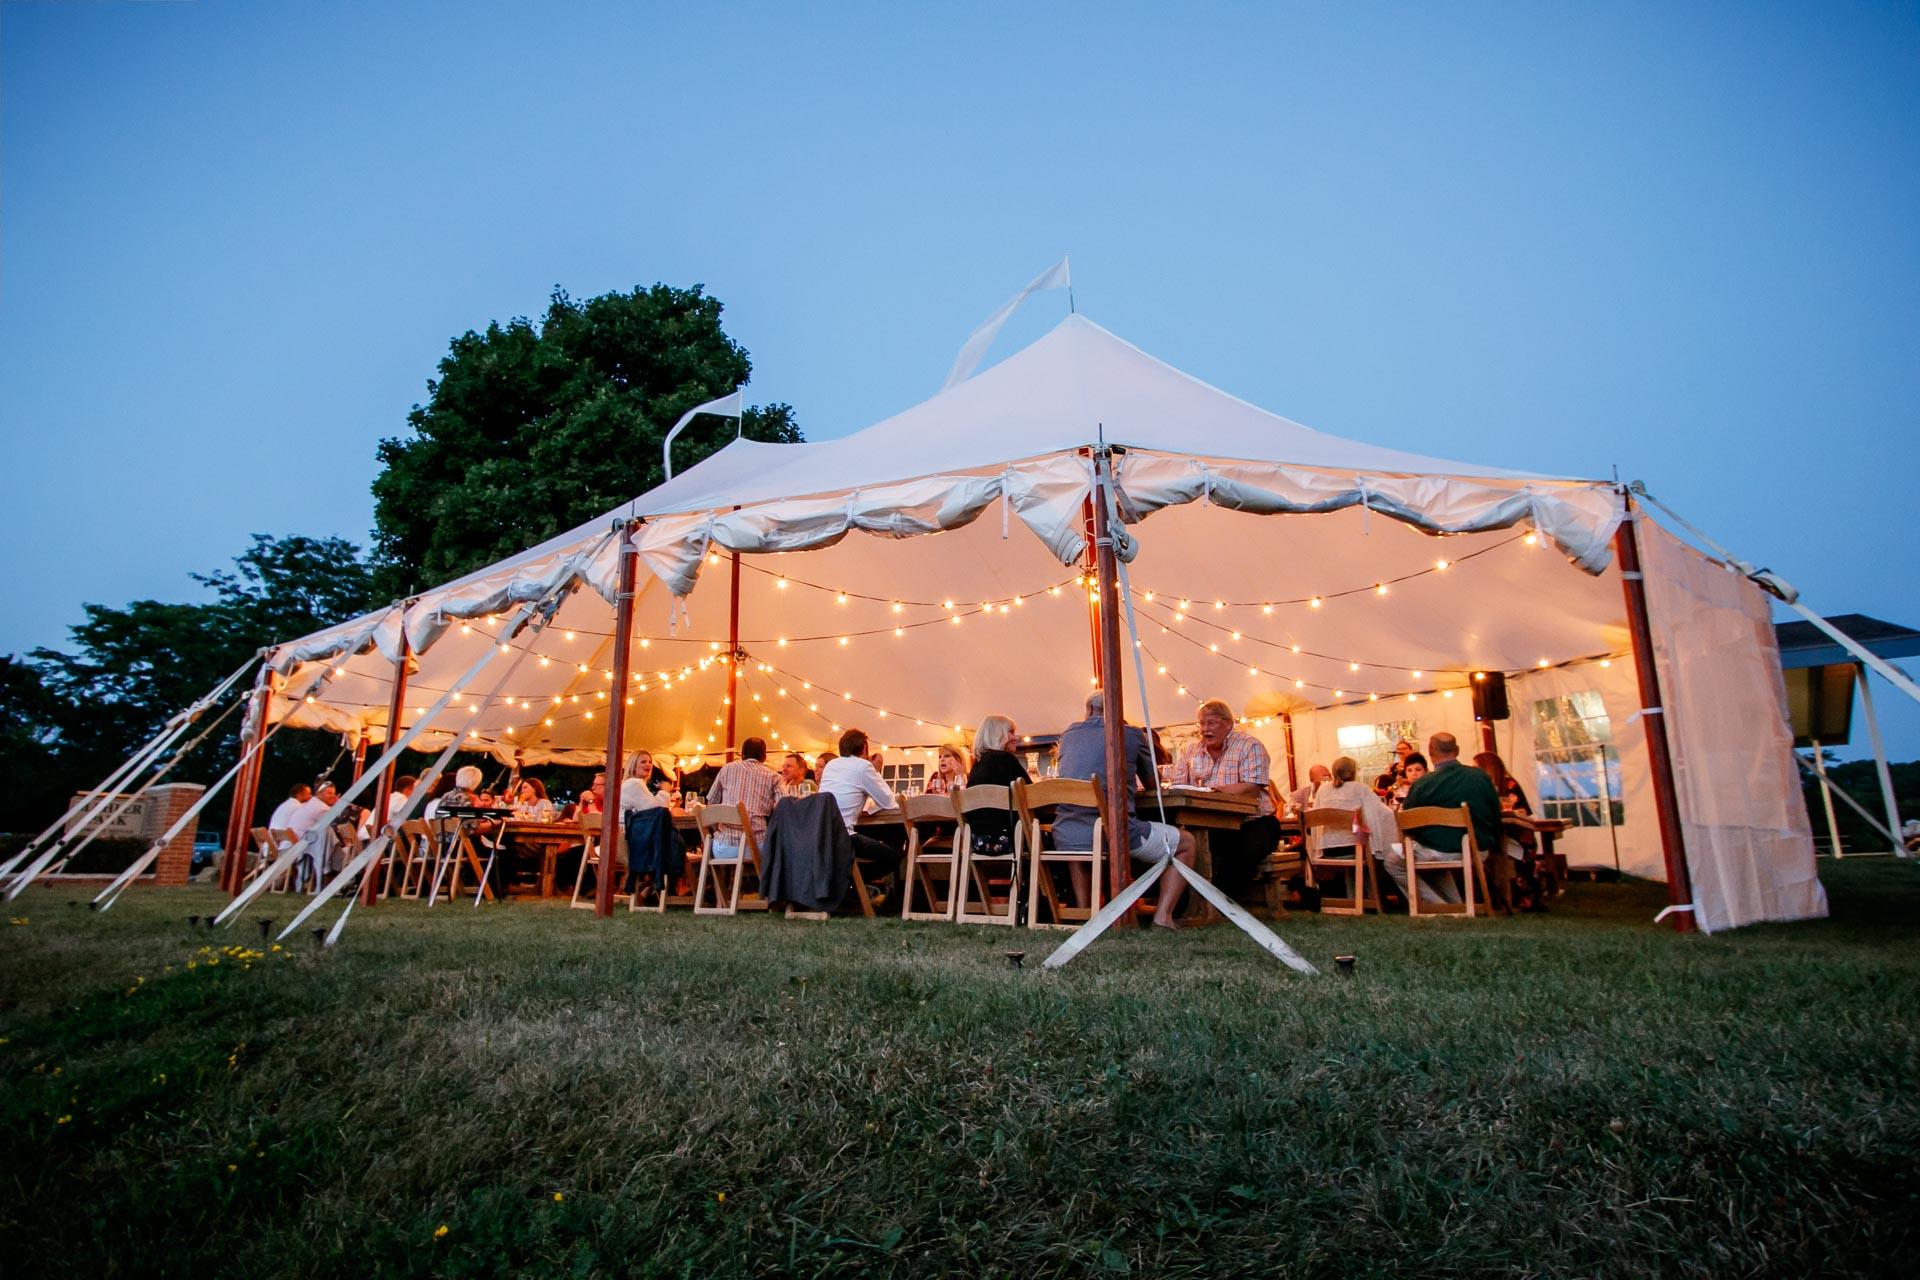 future-neenah-sunset-dinner-farm-to-table-adam-shea-photography-green-bay-appleton-neenah-photographer-30.jpg